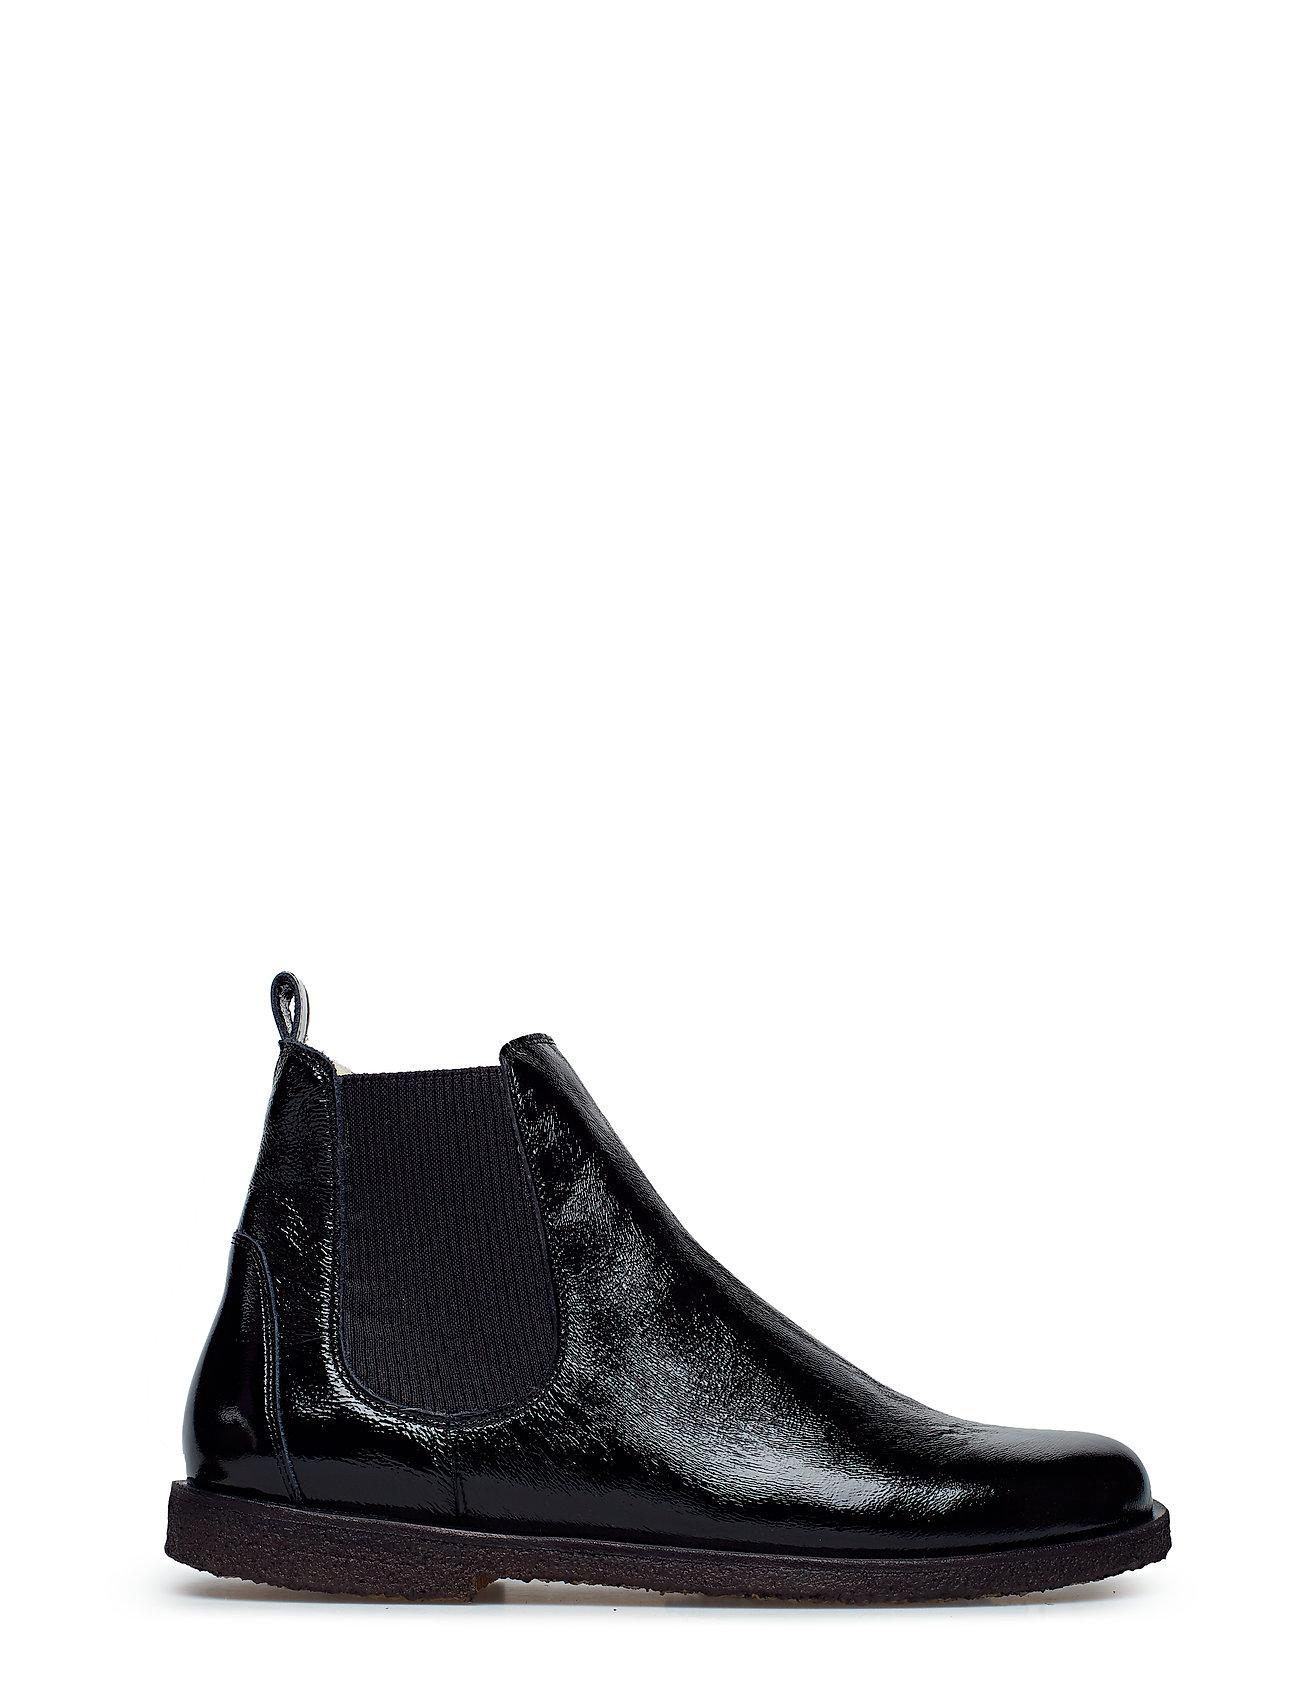 ANGULUS Chelsea boot - 1310/019 BLACK/BLACK